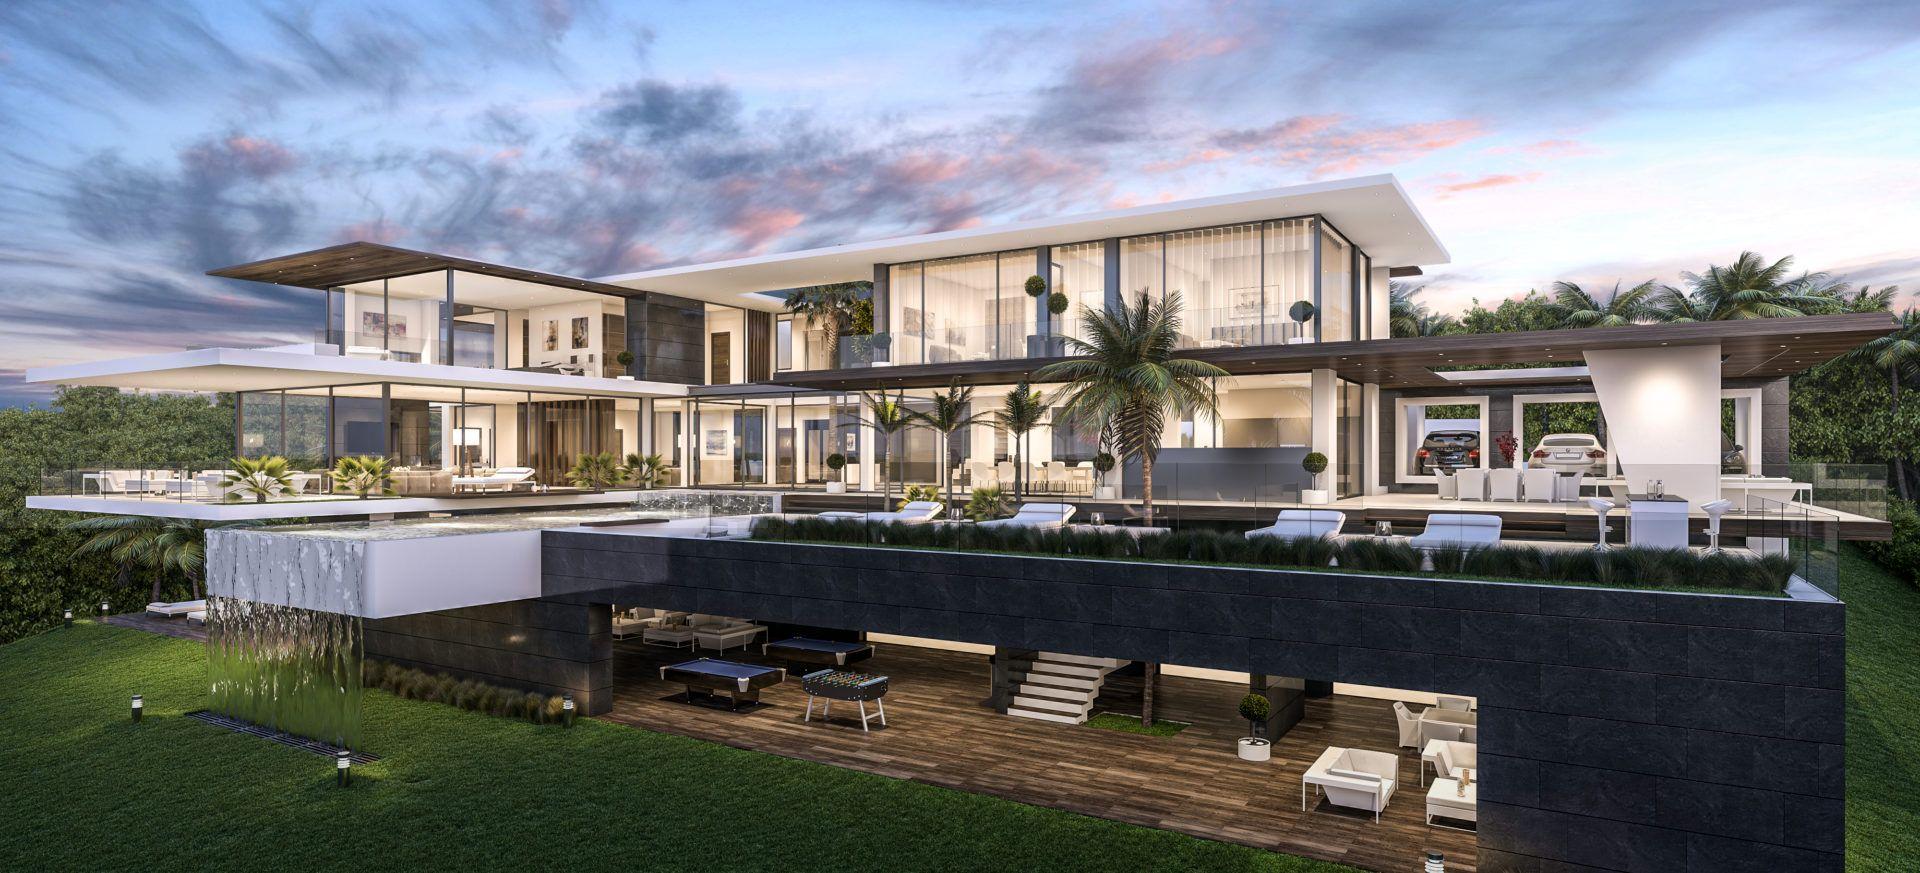 Spectacular Project In La Zagaleta Modern Villas Luxury Homes Dream Houses Luxury Villa Design Modern Villa Design